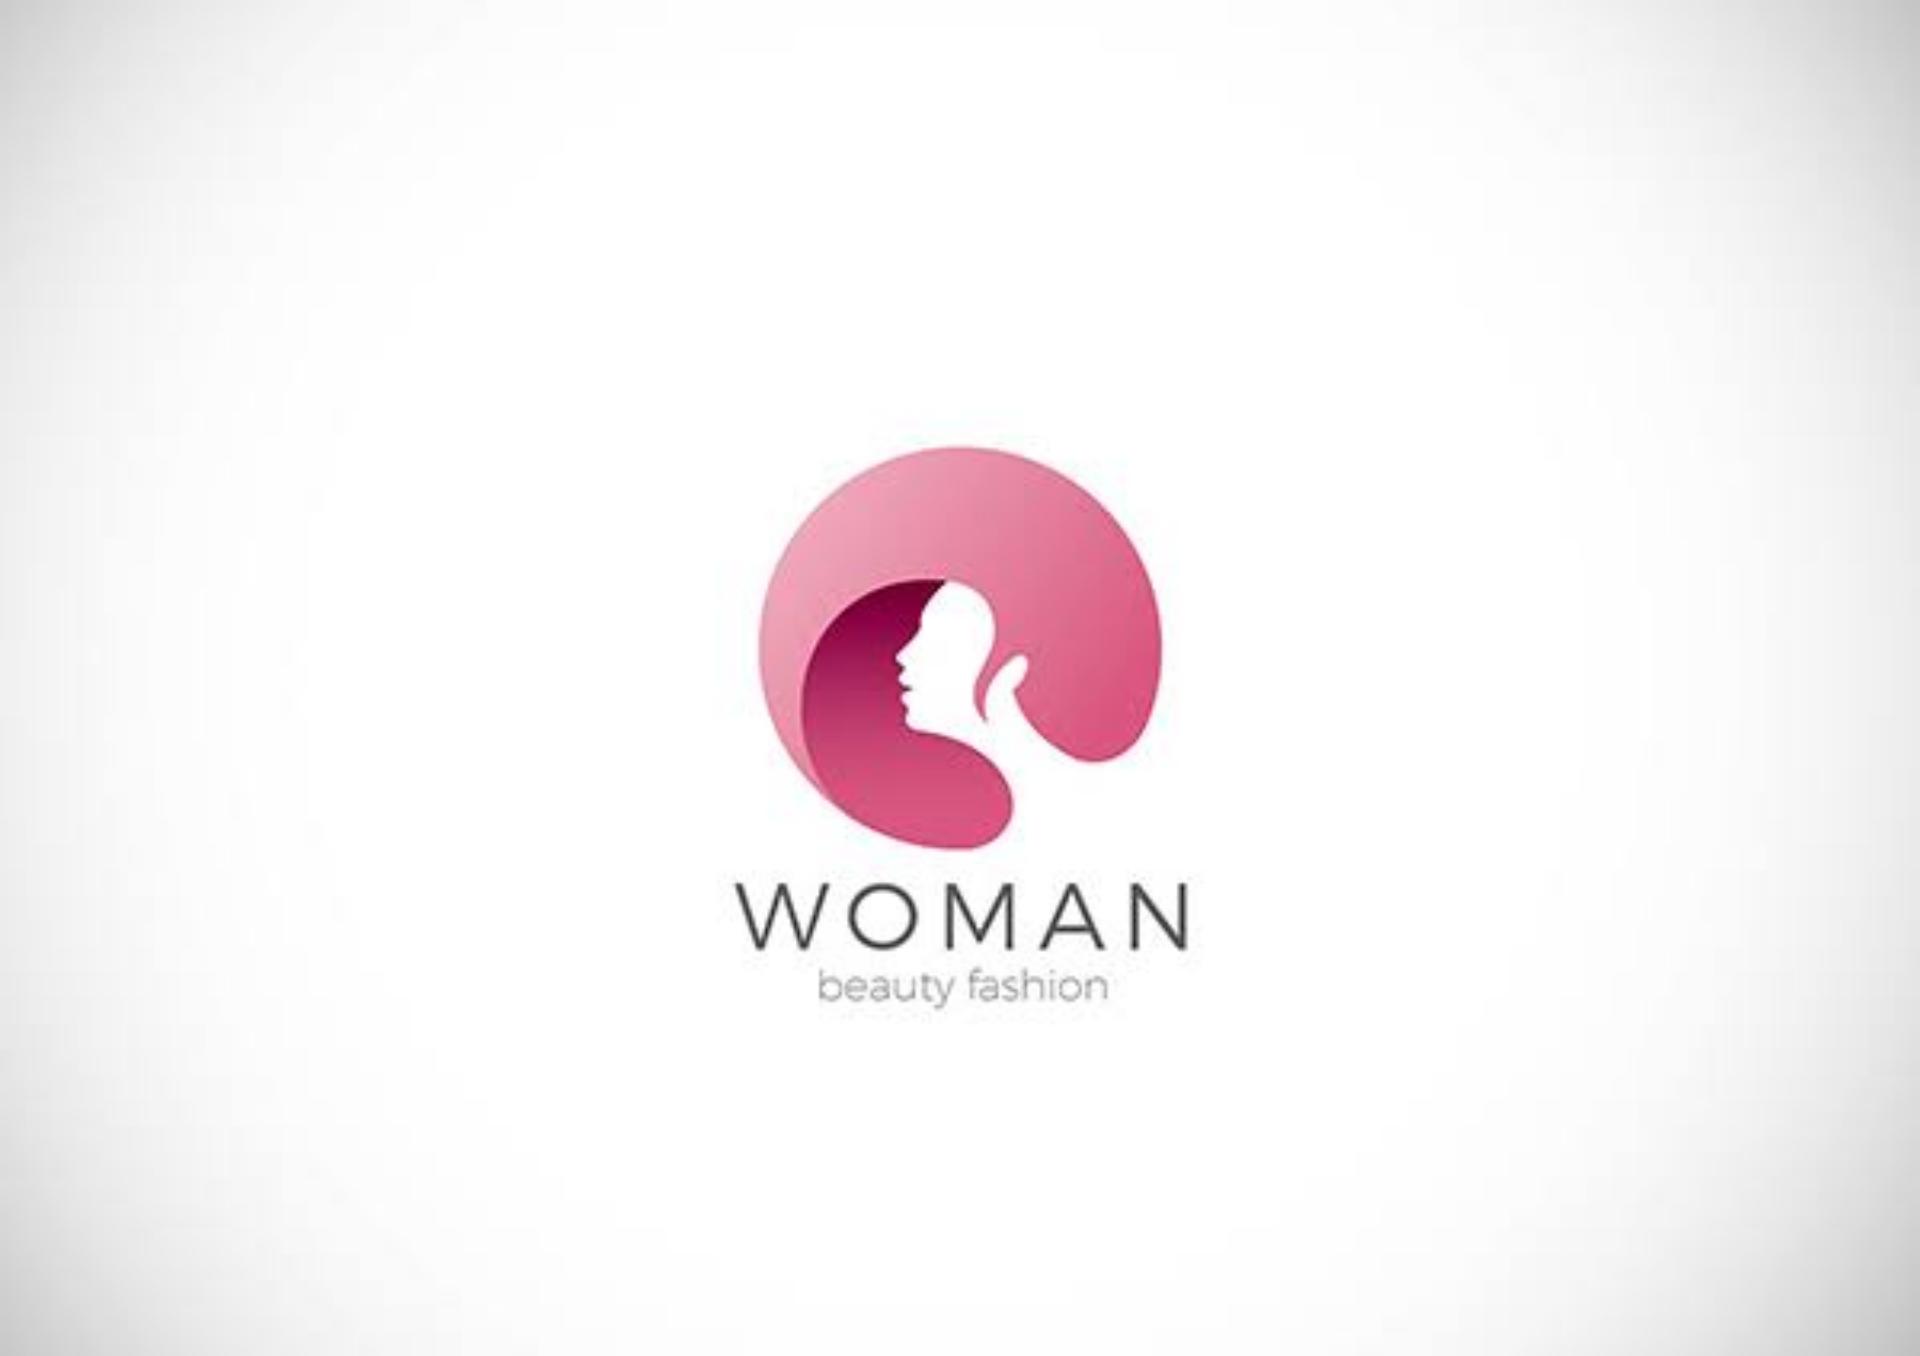 professional woman beauty fashion logo